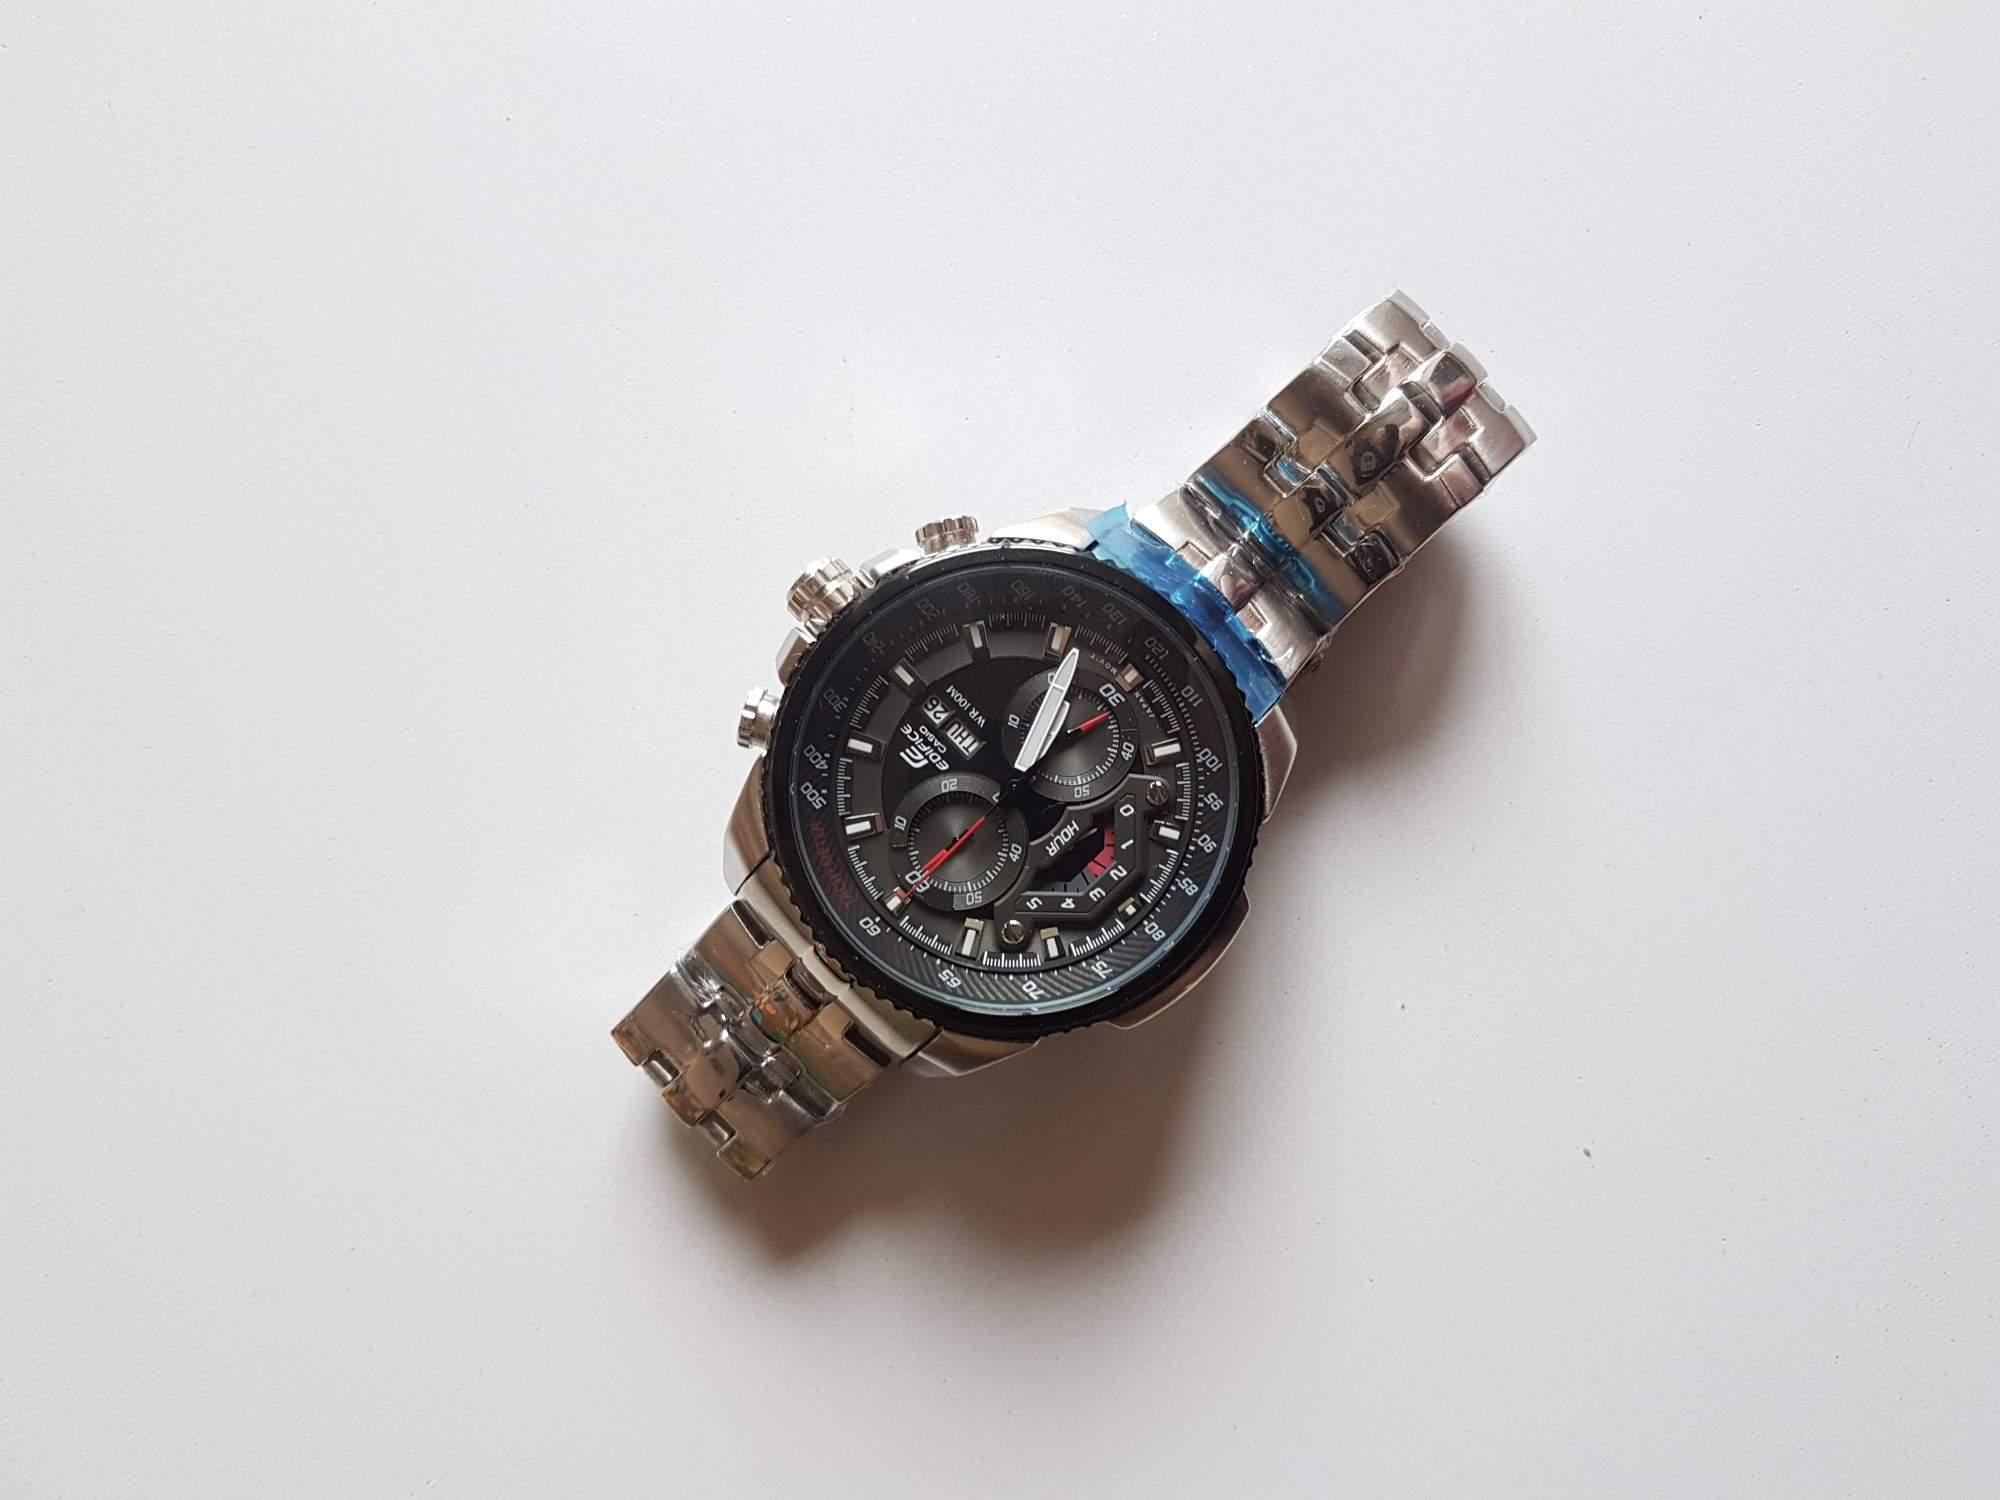 Hodinky Casio Edifice Chronograph EF-558D-1AV - aukce online - auktiva d03999c542b